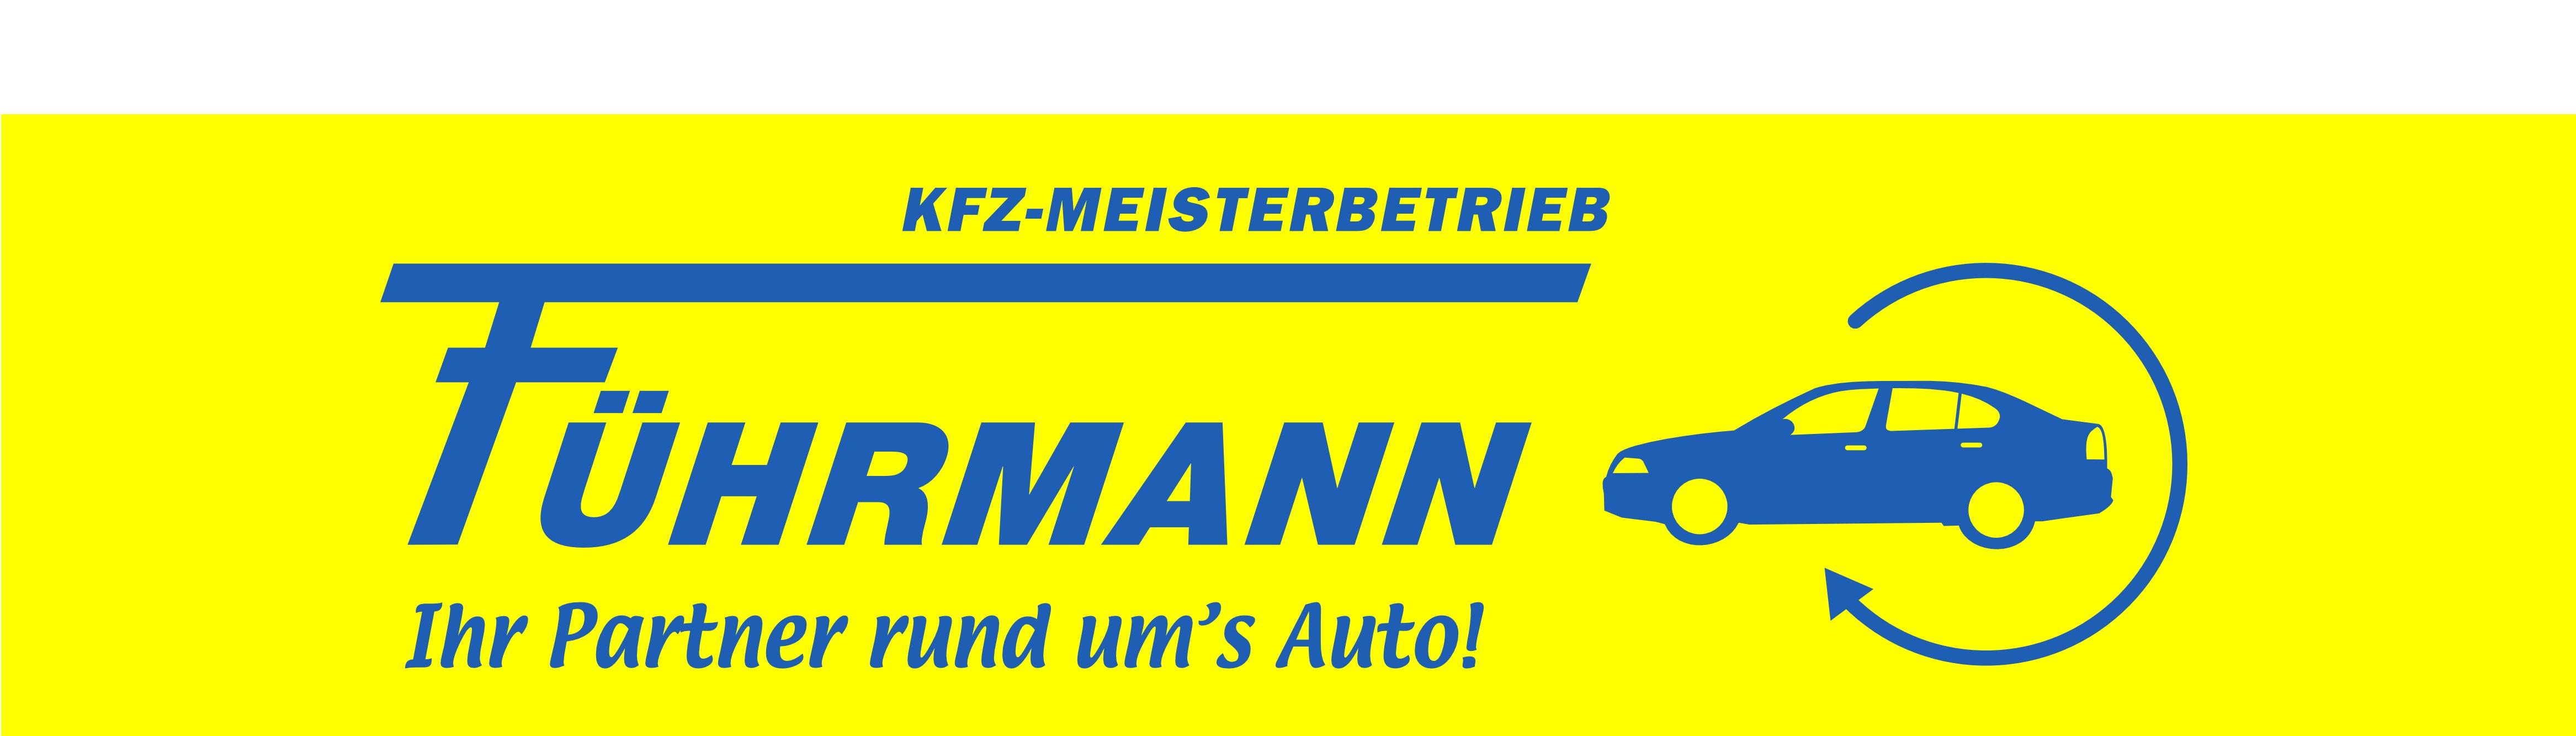 KFZ-MEISTERBETRIEB FÜHRMANN